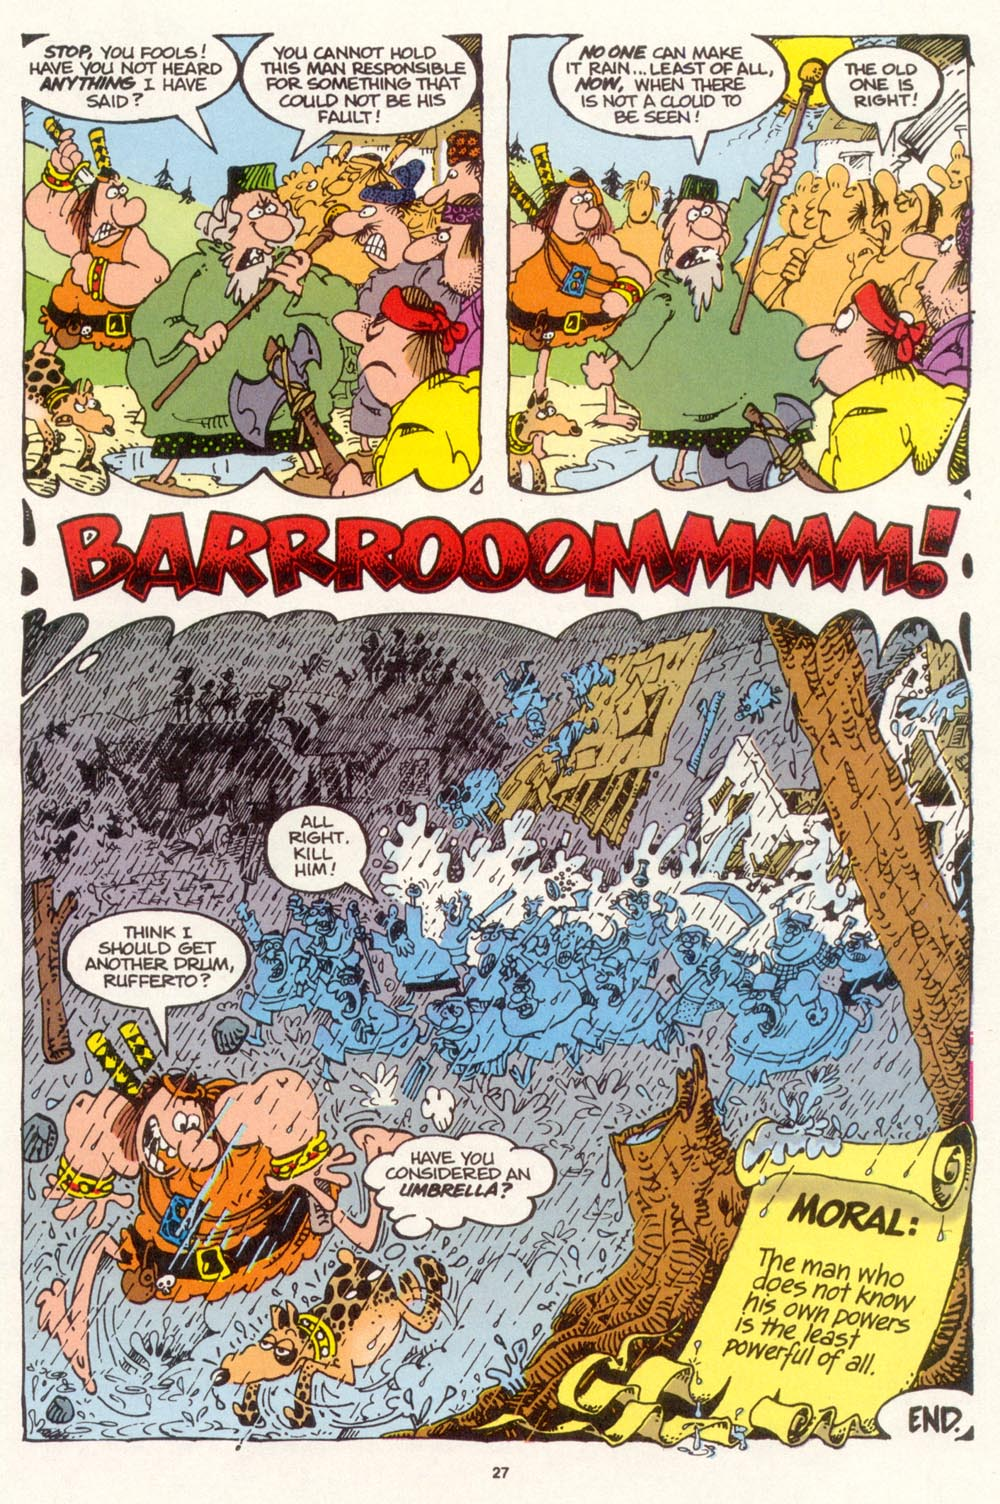 Read online Sergio Aragonés Groo the Wanderer comic -  Issue #113 - 29